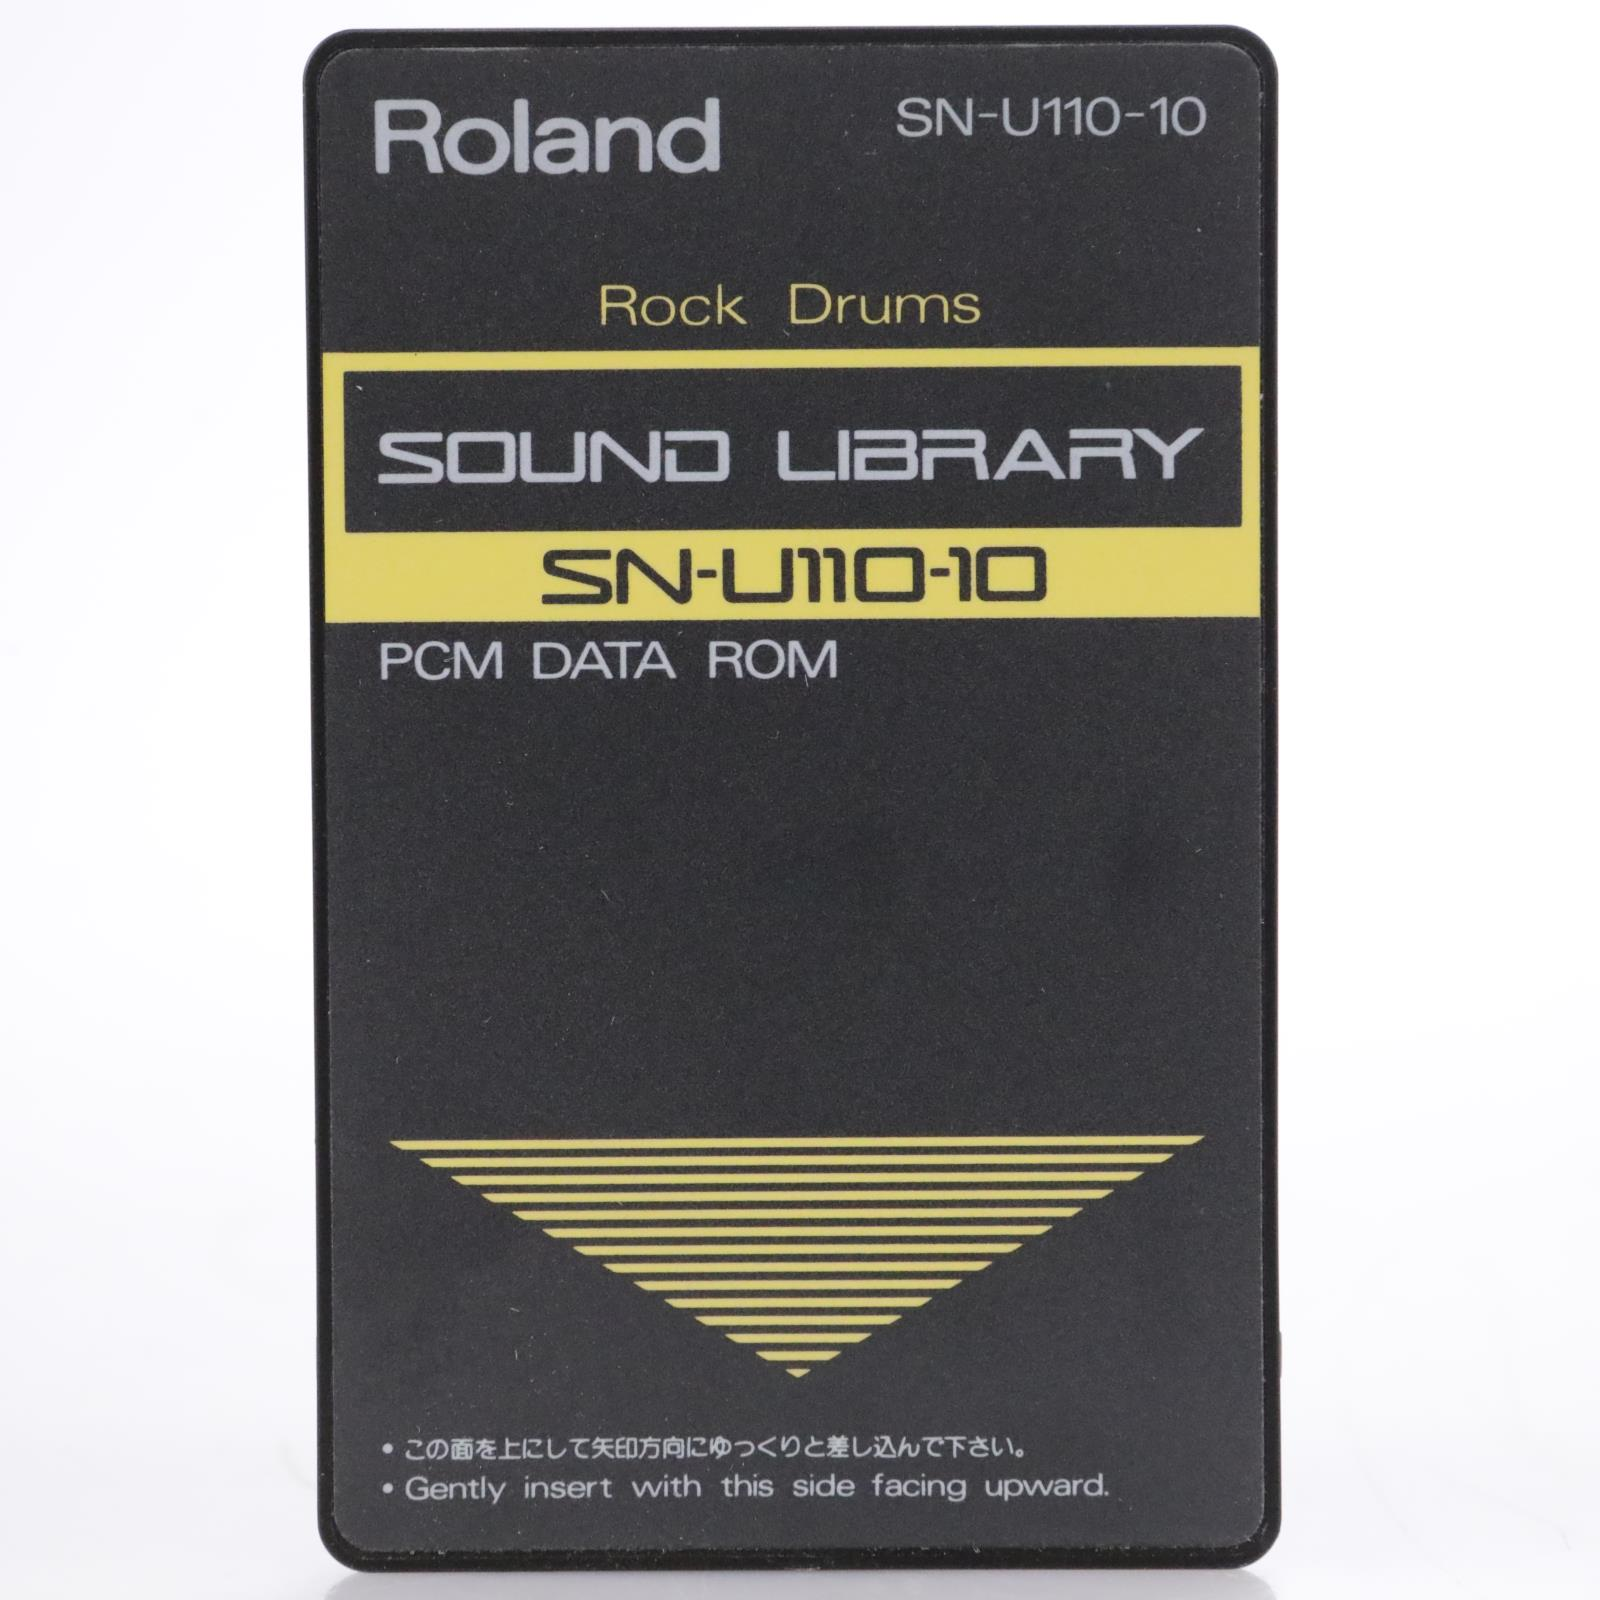 Roland SN-U110-10 Rock Drums PCM Data Card #44163